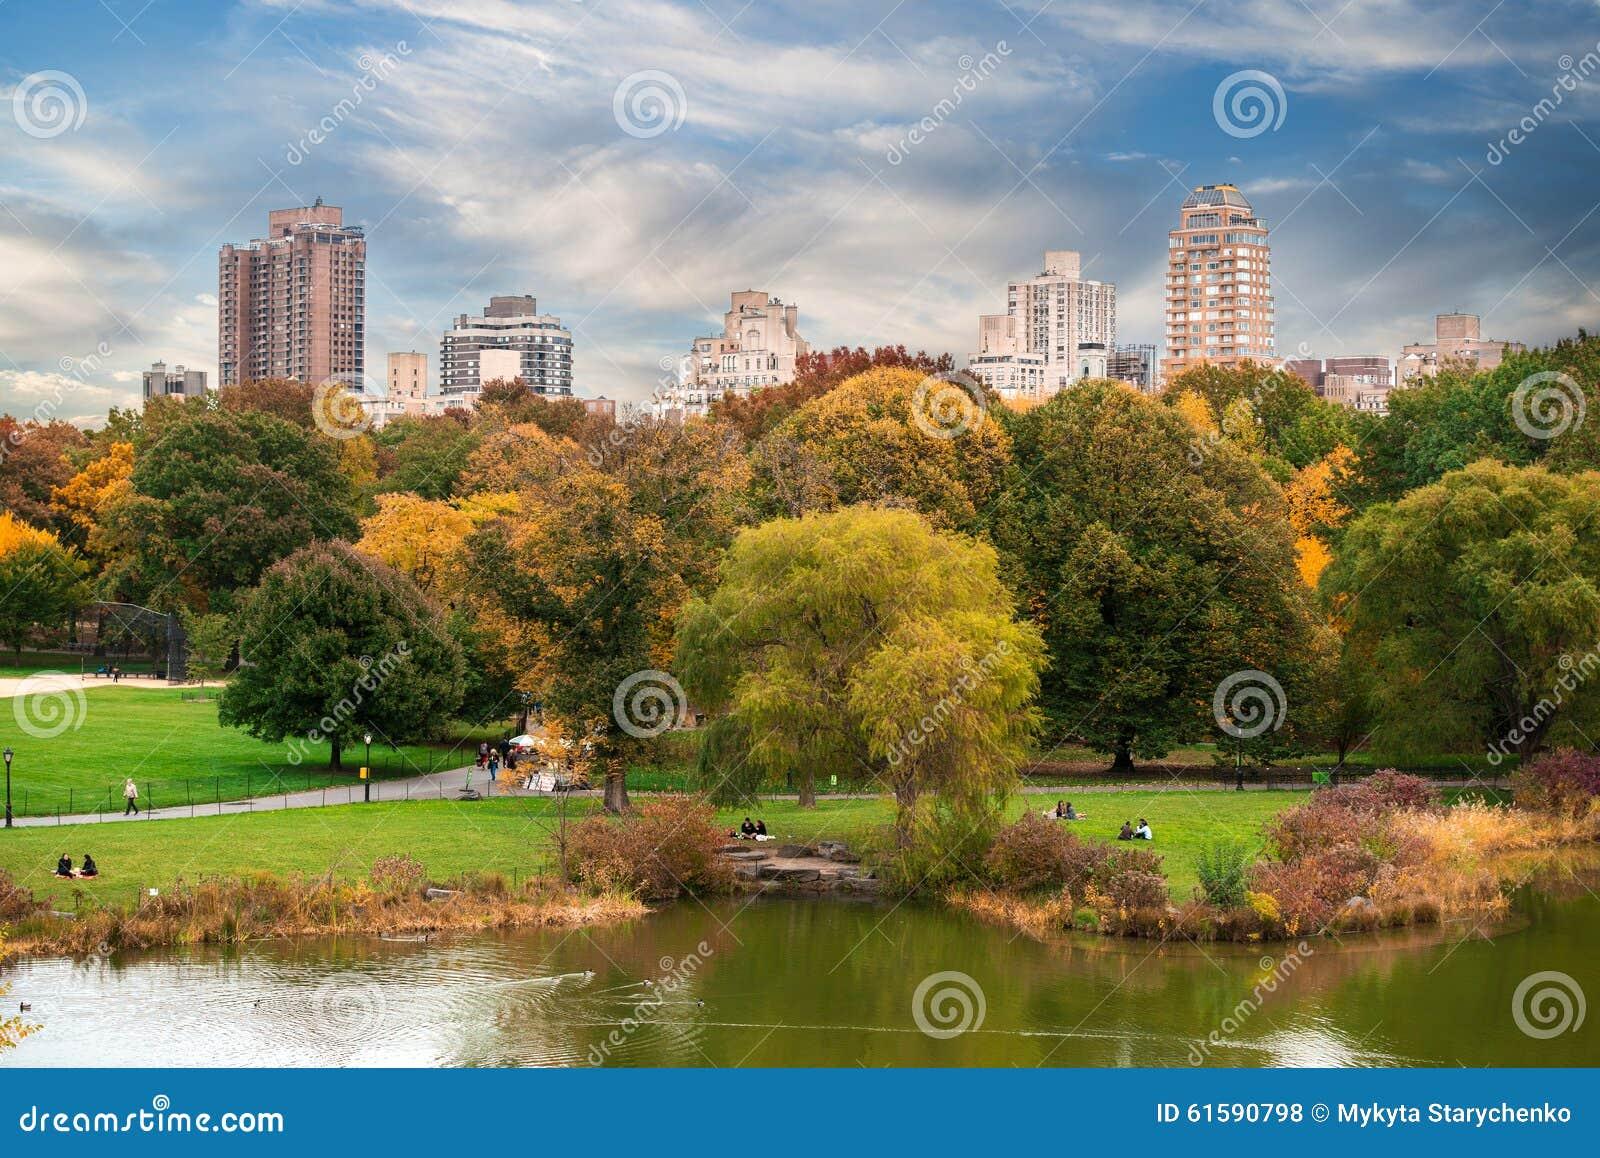 New york city manhattan central park panorama with autumn lake